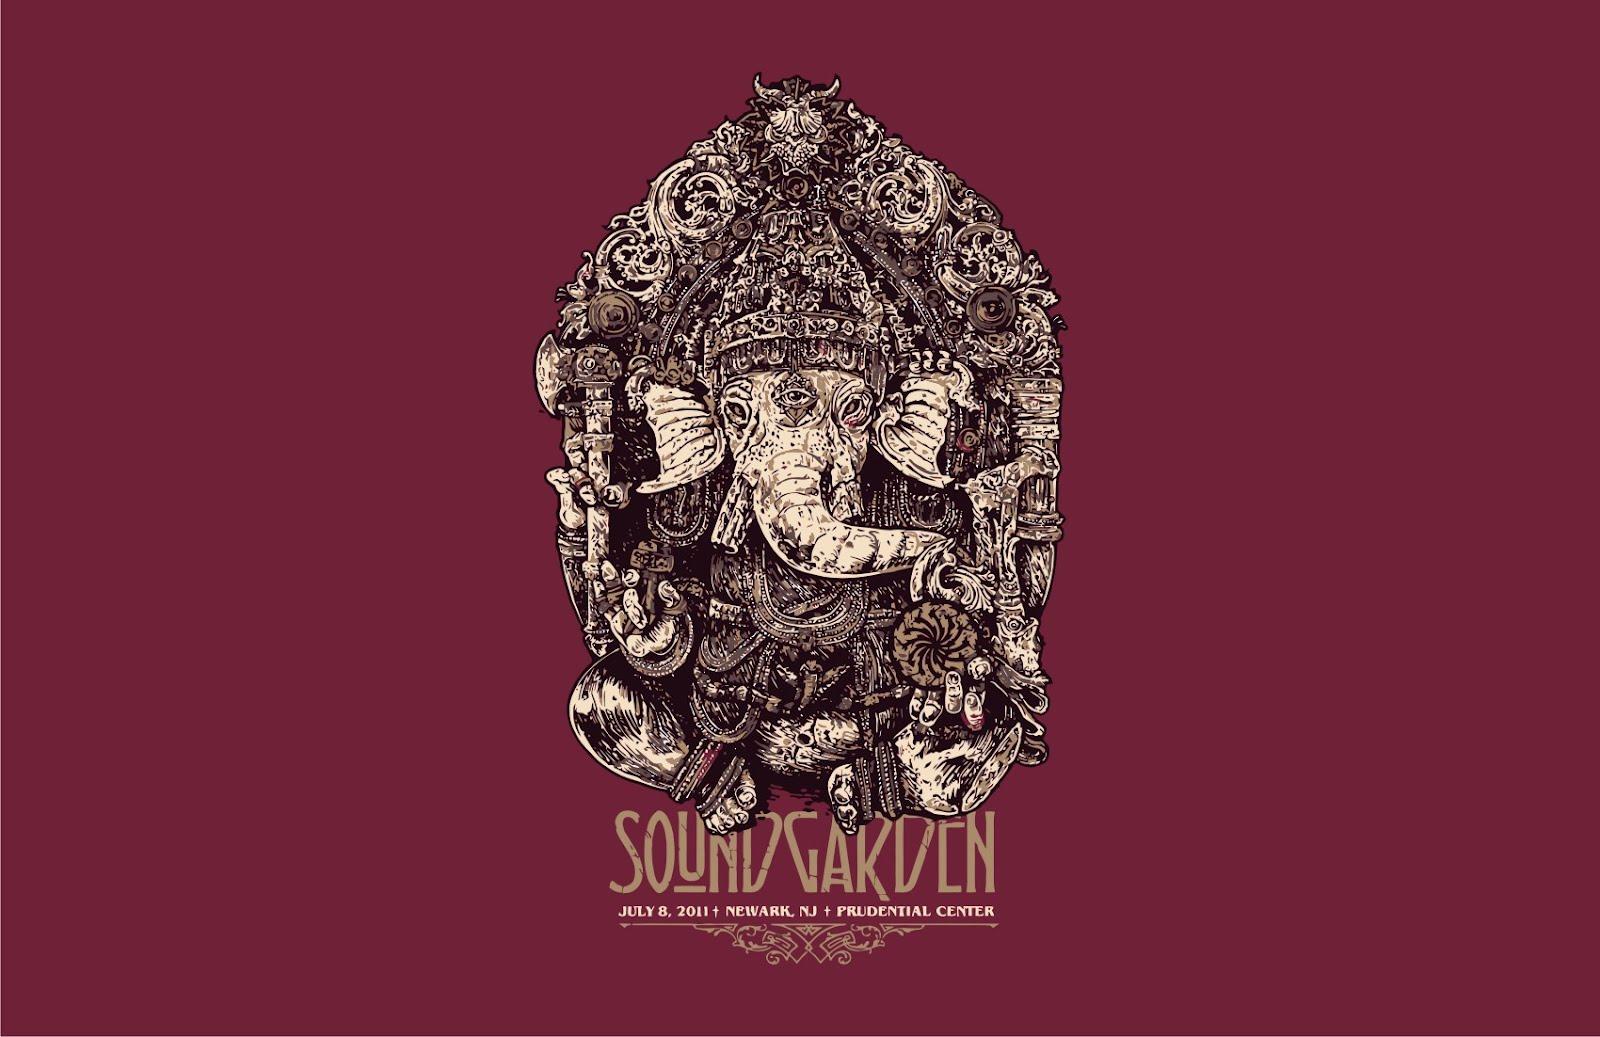 soundgarden-poster_newark_2011_front_vector